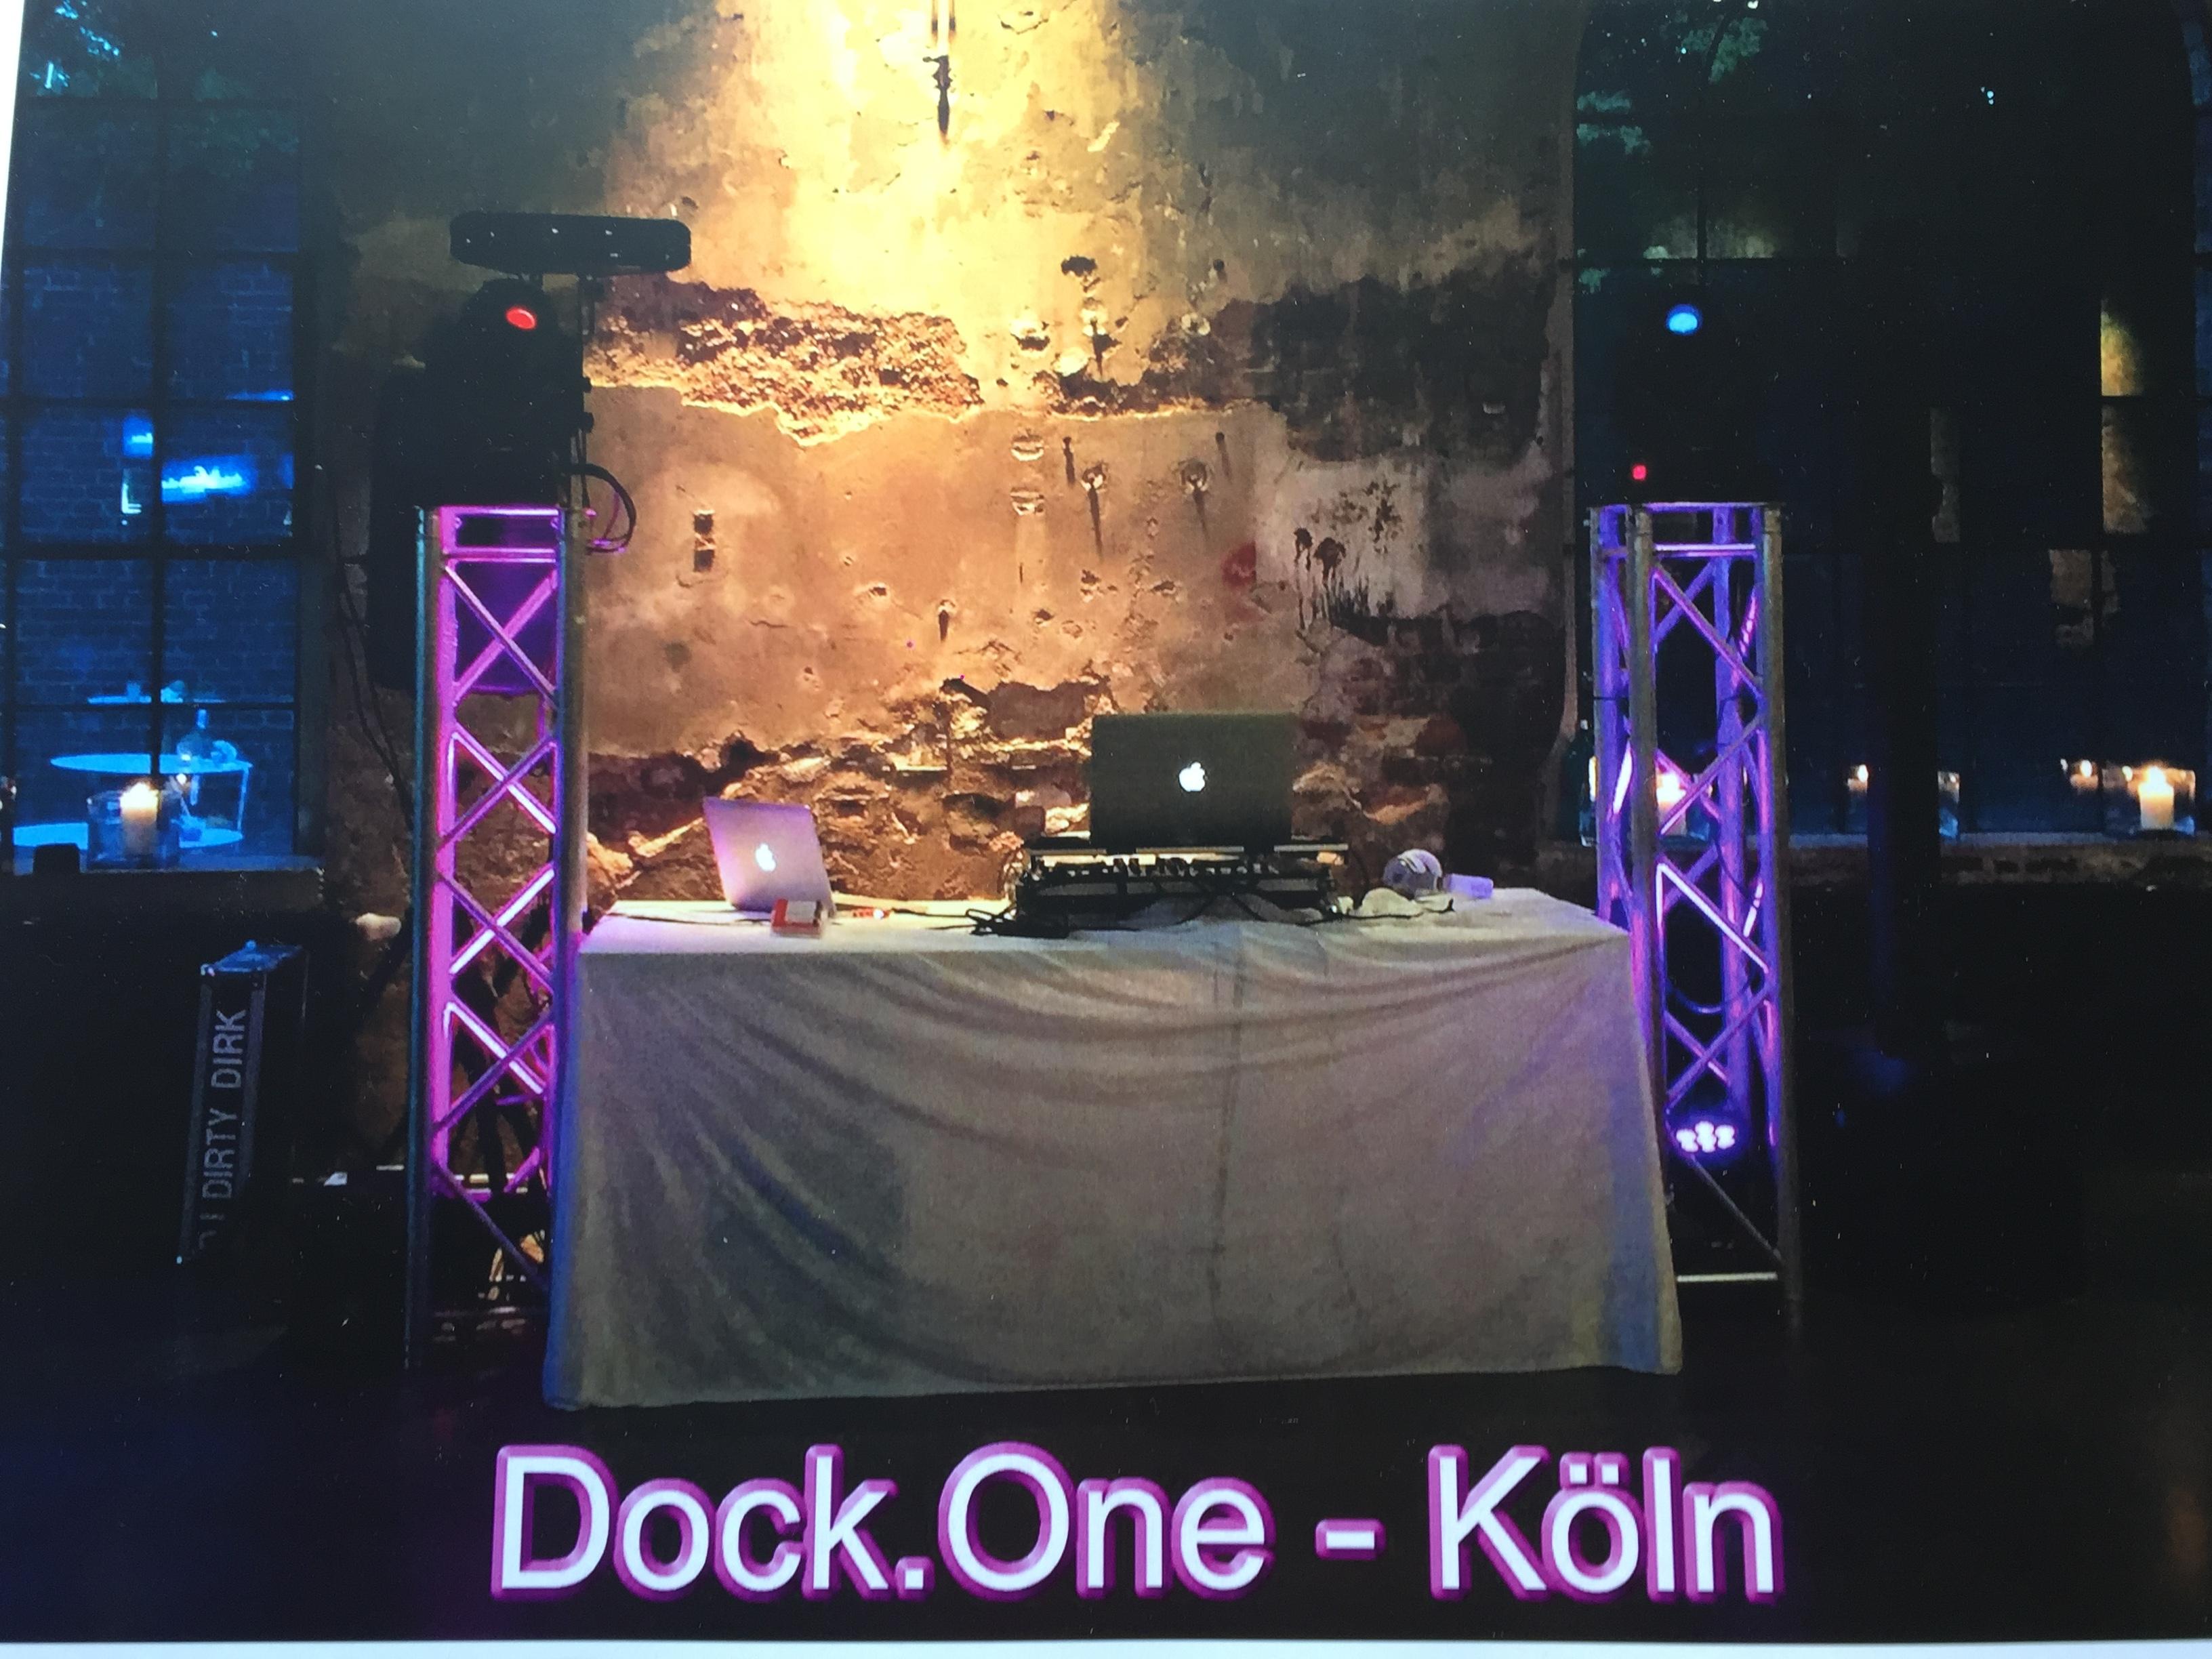 Dock.One - Köln - Hochzeit - Daniel - 2016 09 03 - 46